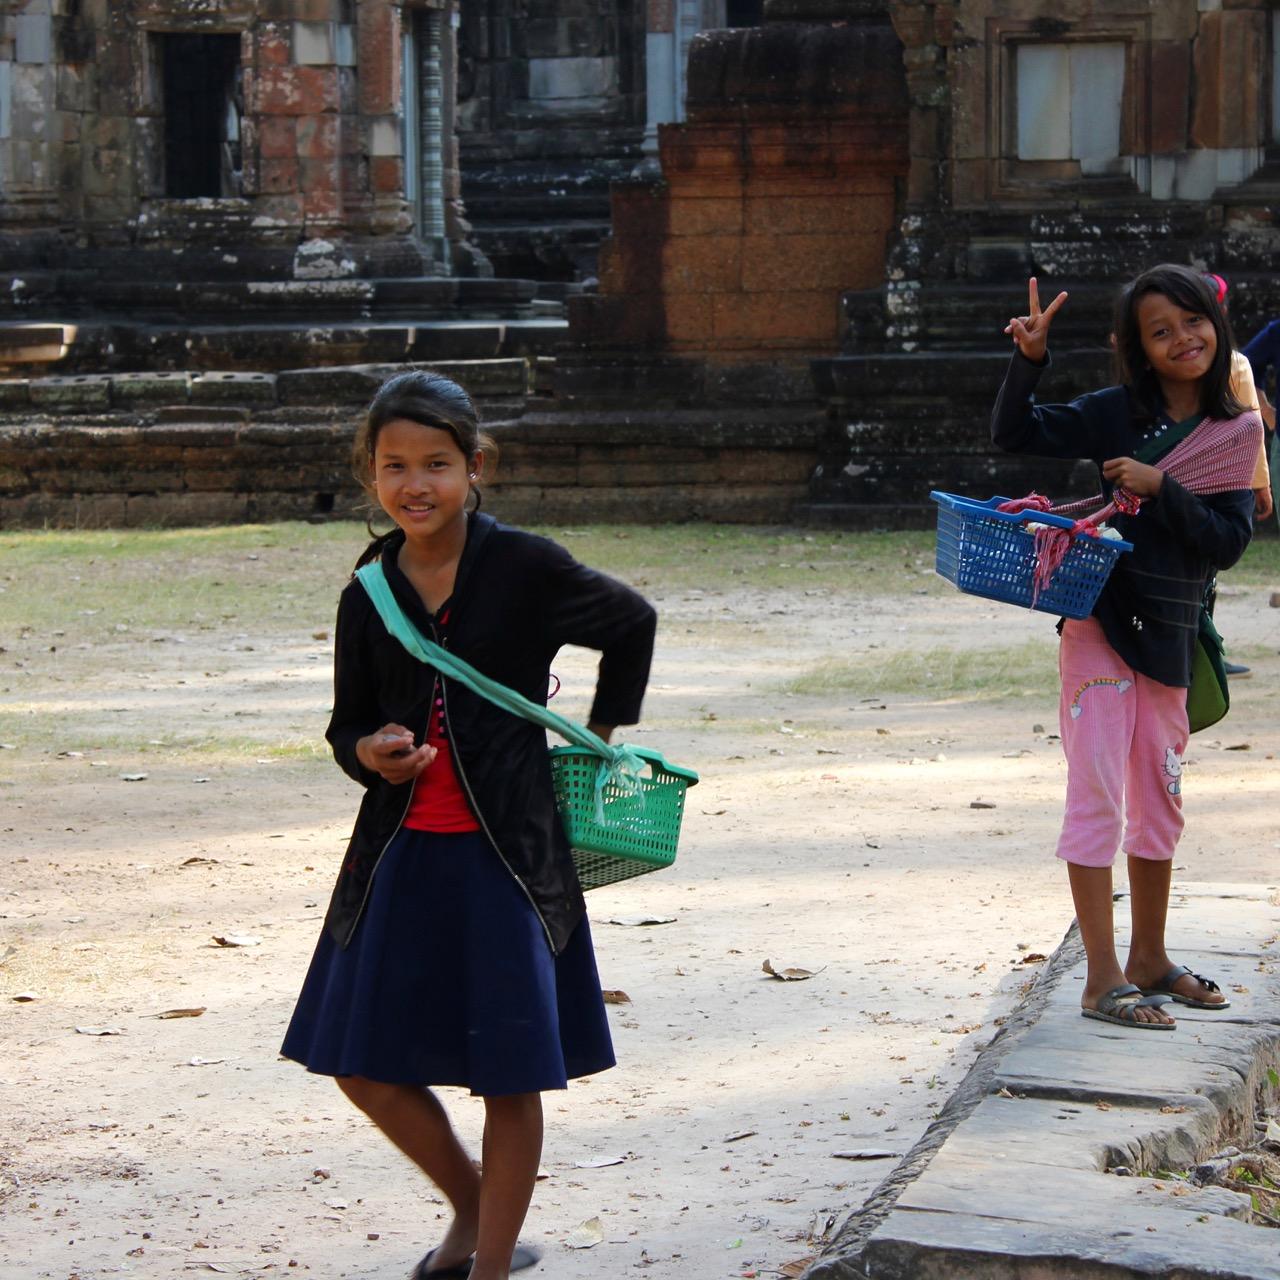 Angkor Wat, Siem Reap, Cambodia - 30